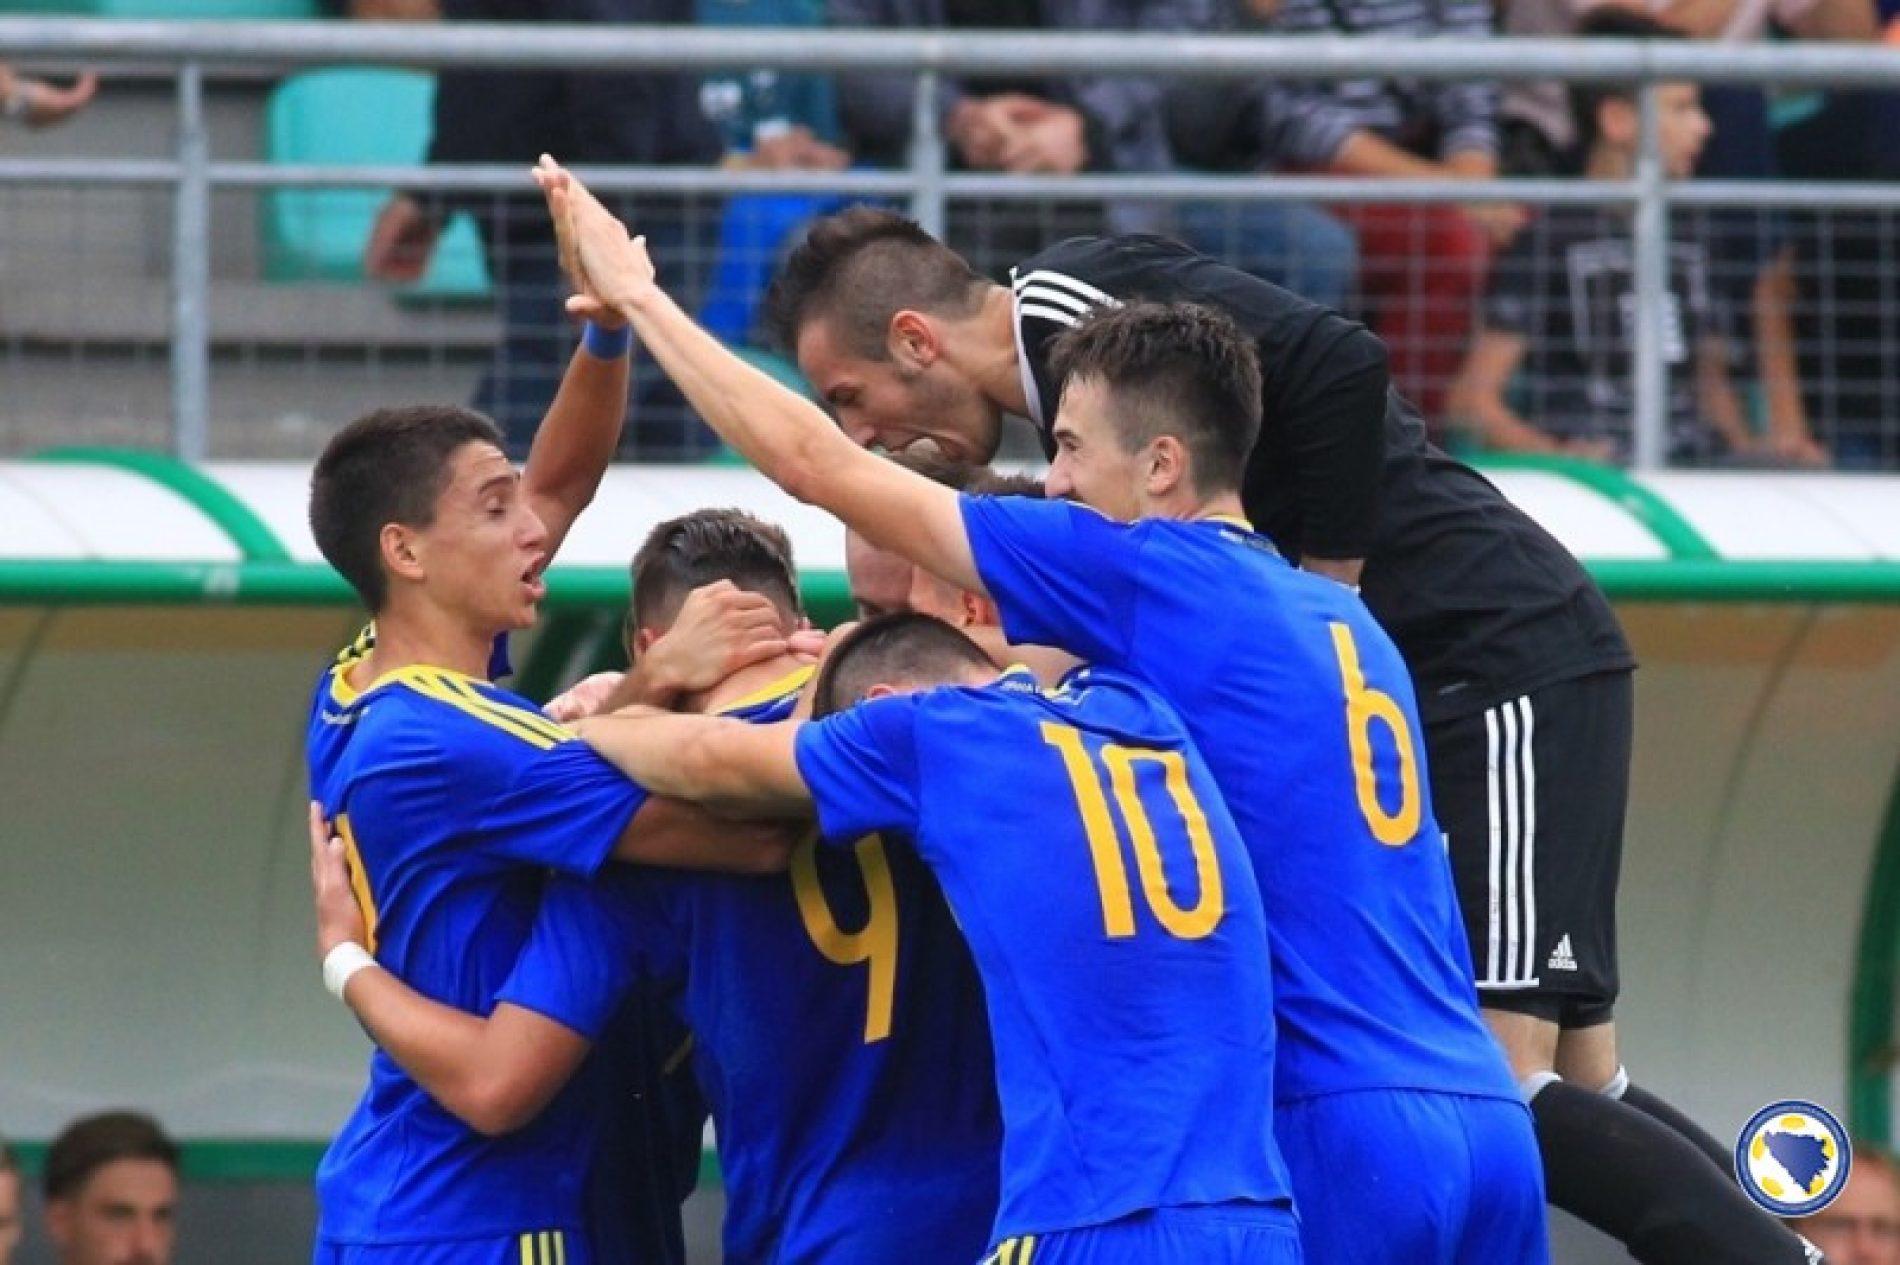 Mladi reprezentativci Bosne i Hercegovine bolji od Švicarske!